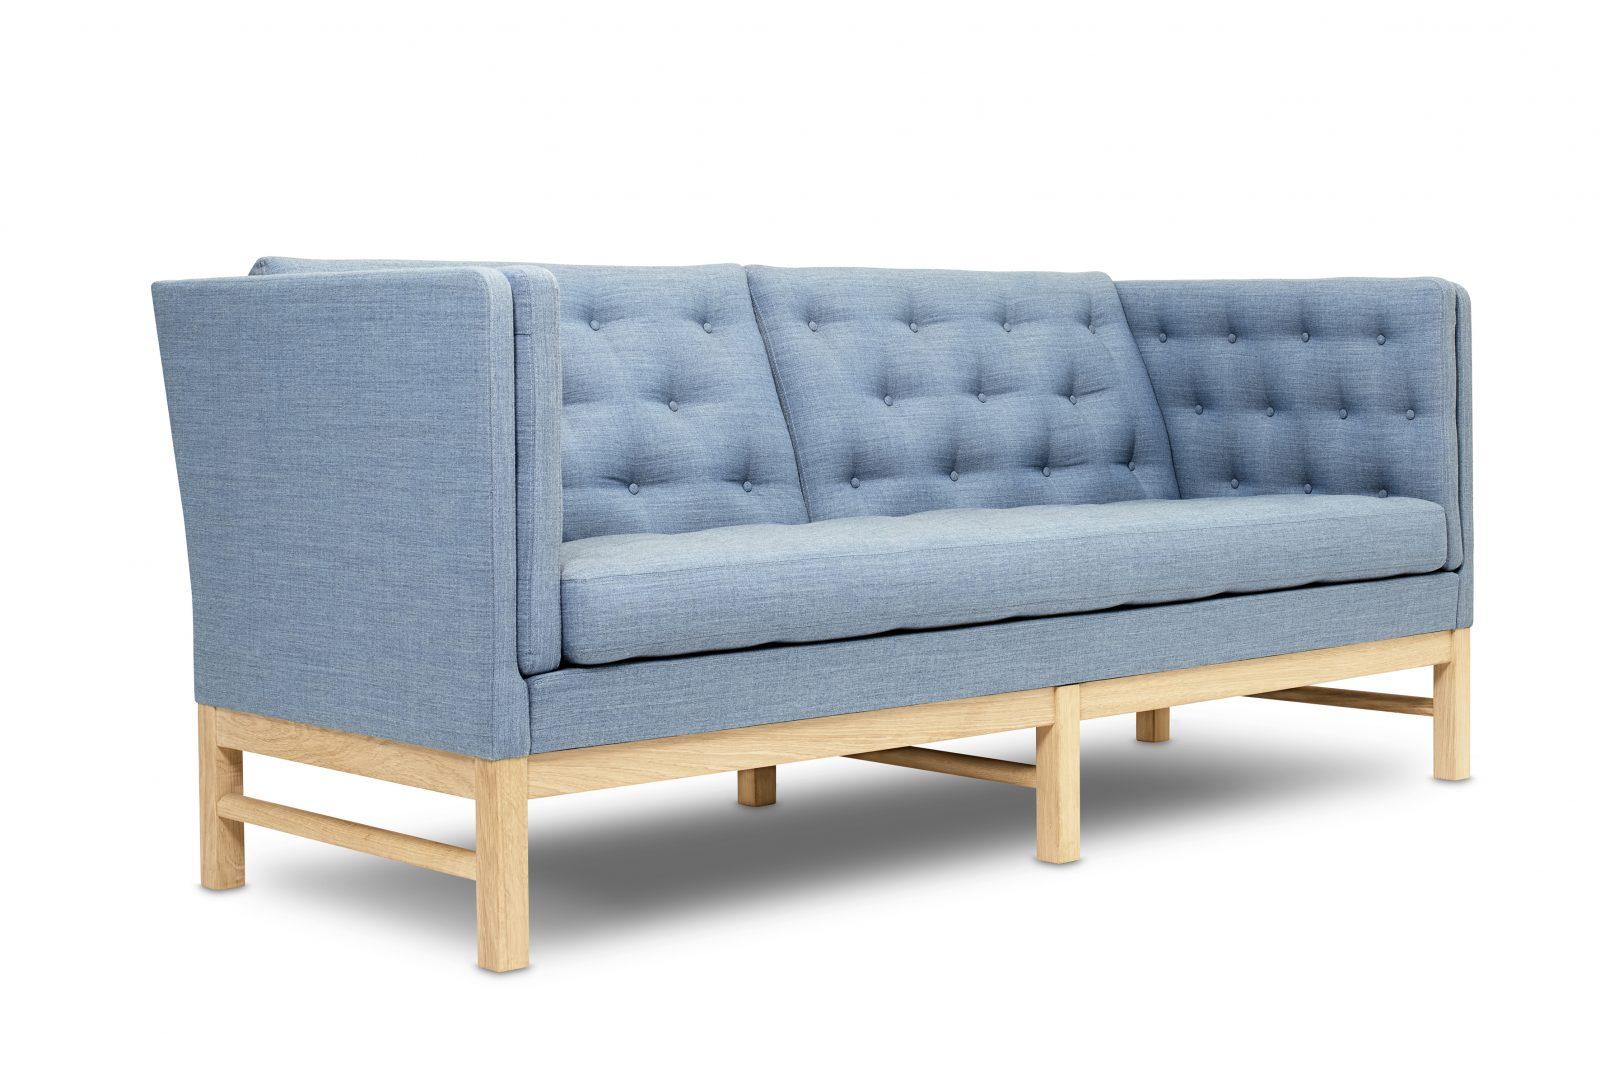 erik jorgensen sofa savannah ej 880 2 lounge sofas from erik j rgensen architonic thesofa. Black Bedroom Furniture Sets. Home Design Ideas